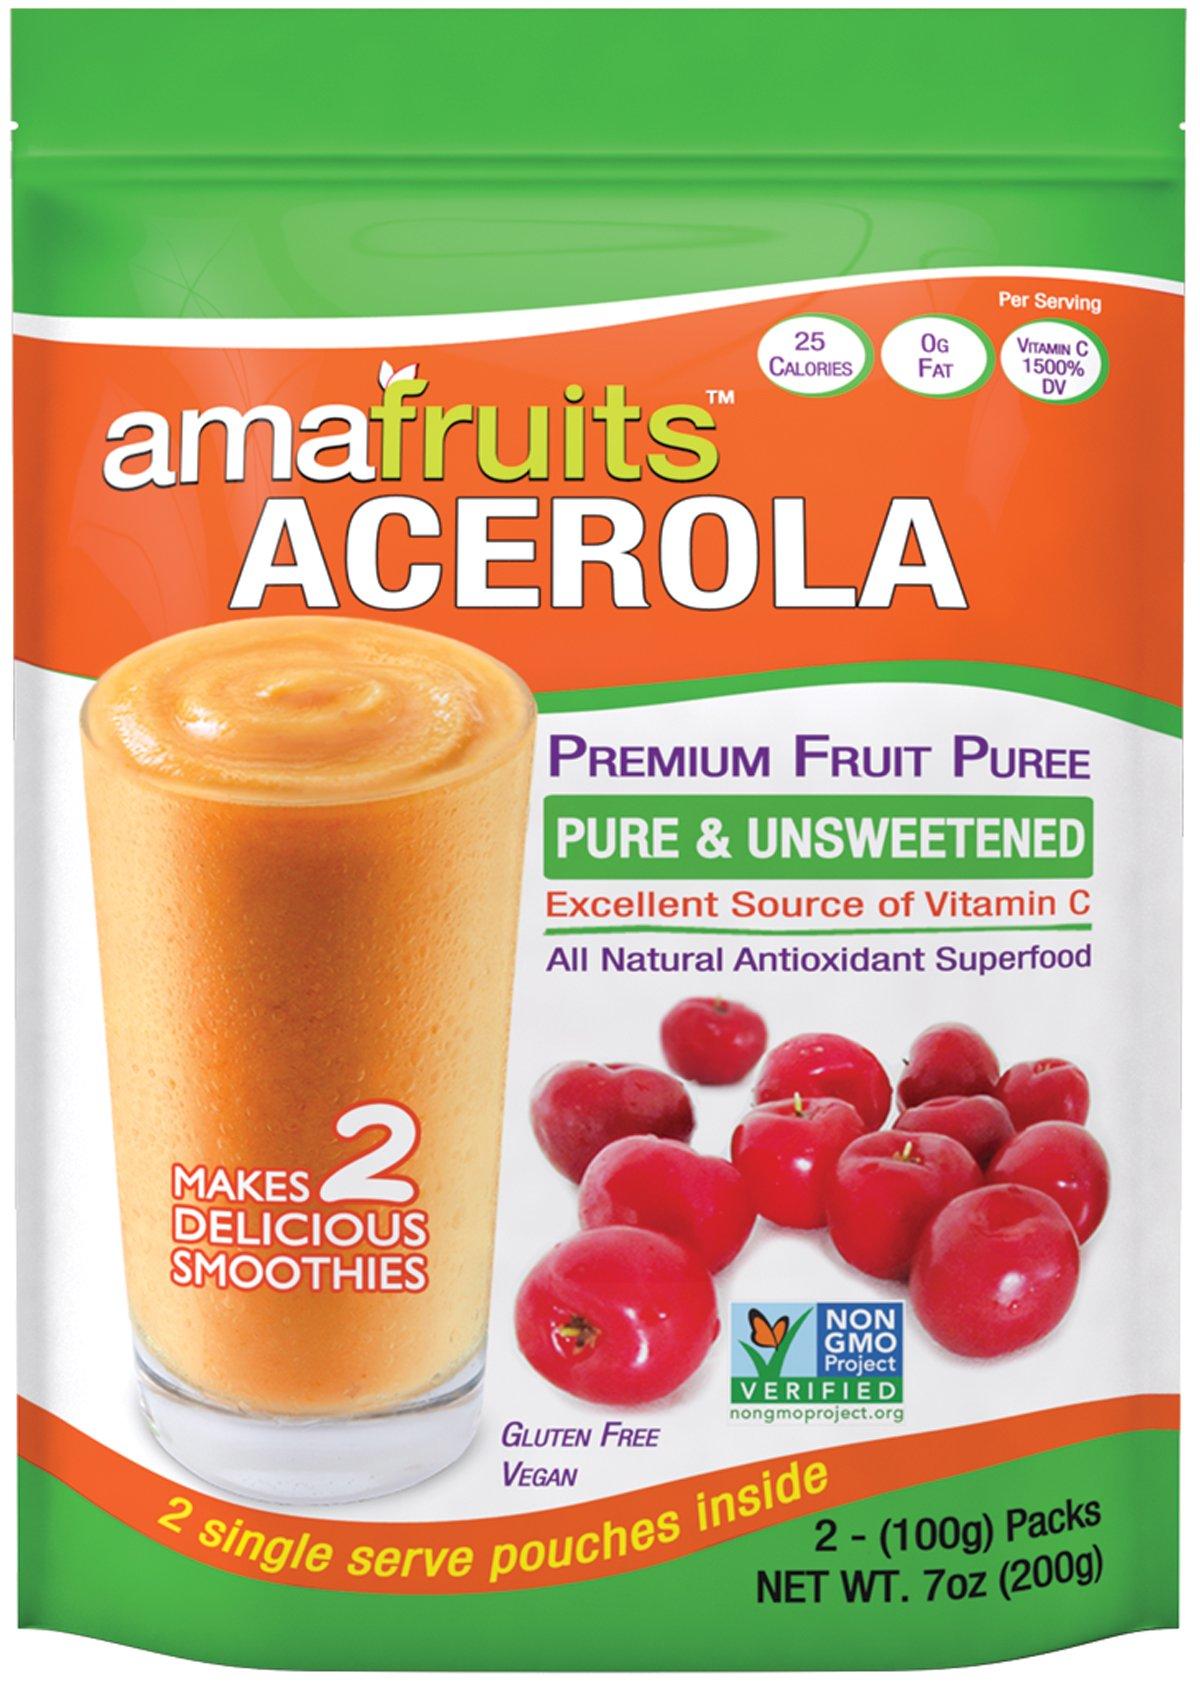 Amafruits 10 Bag Bundle of Acerola Fruit Puree